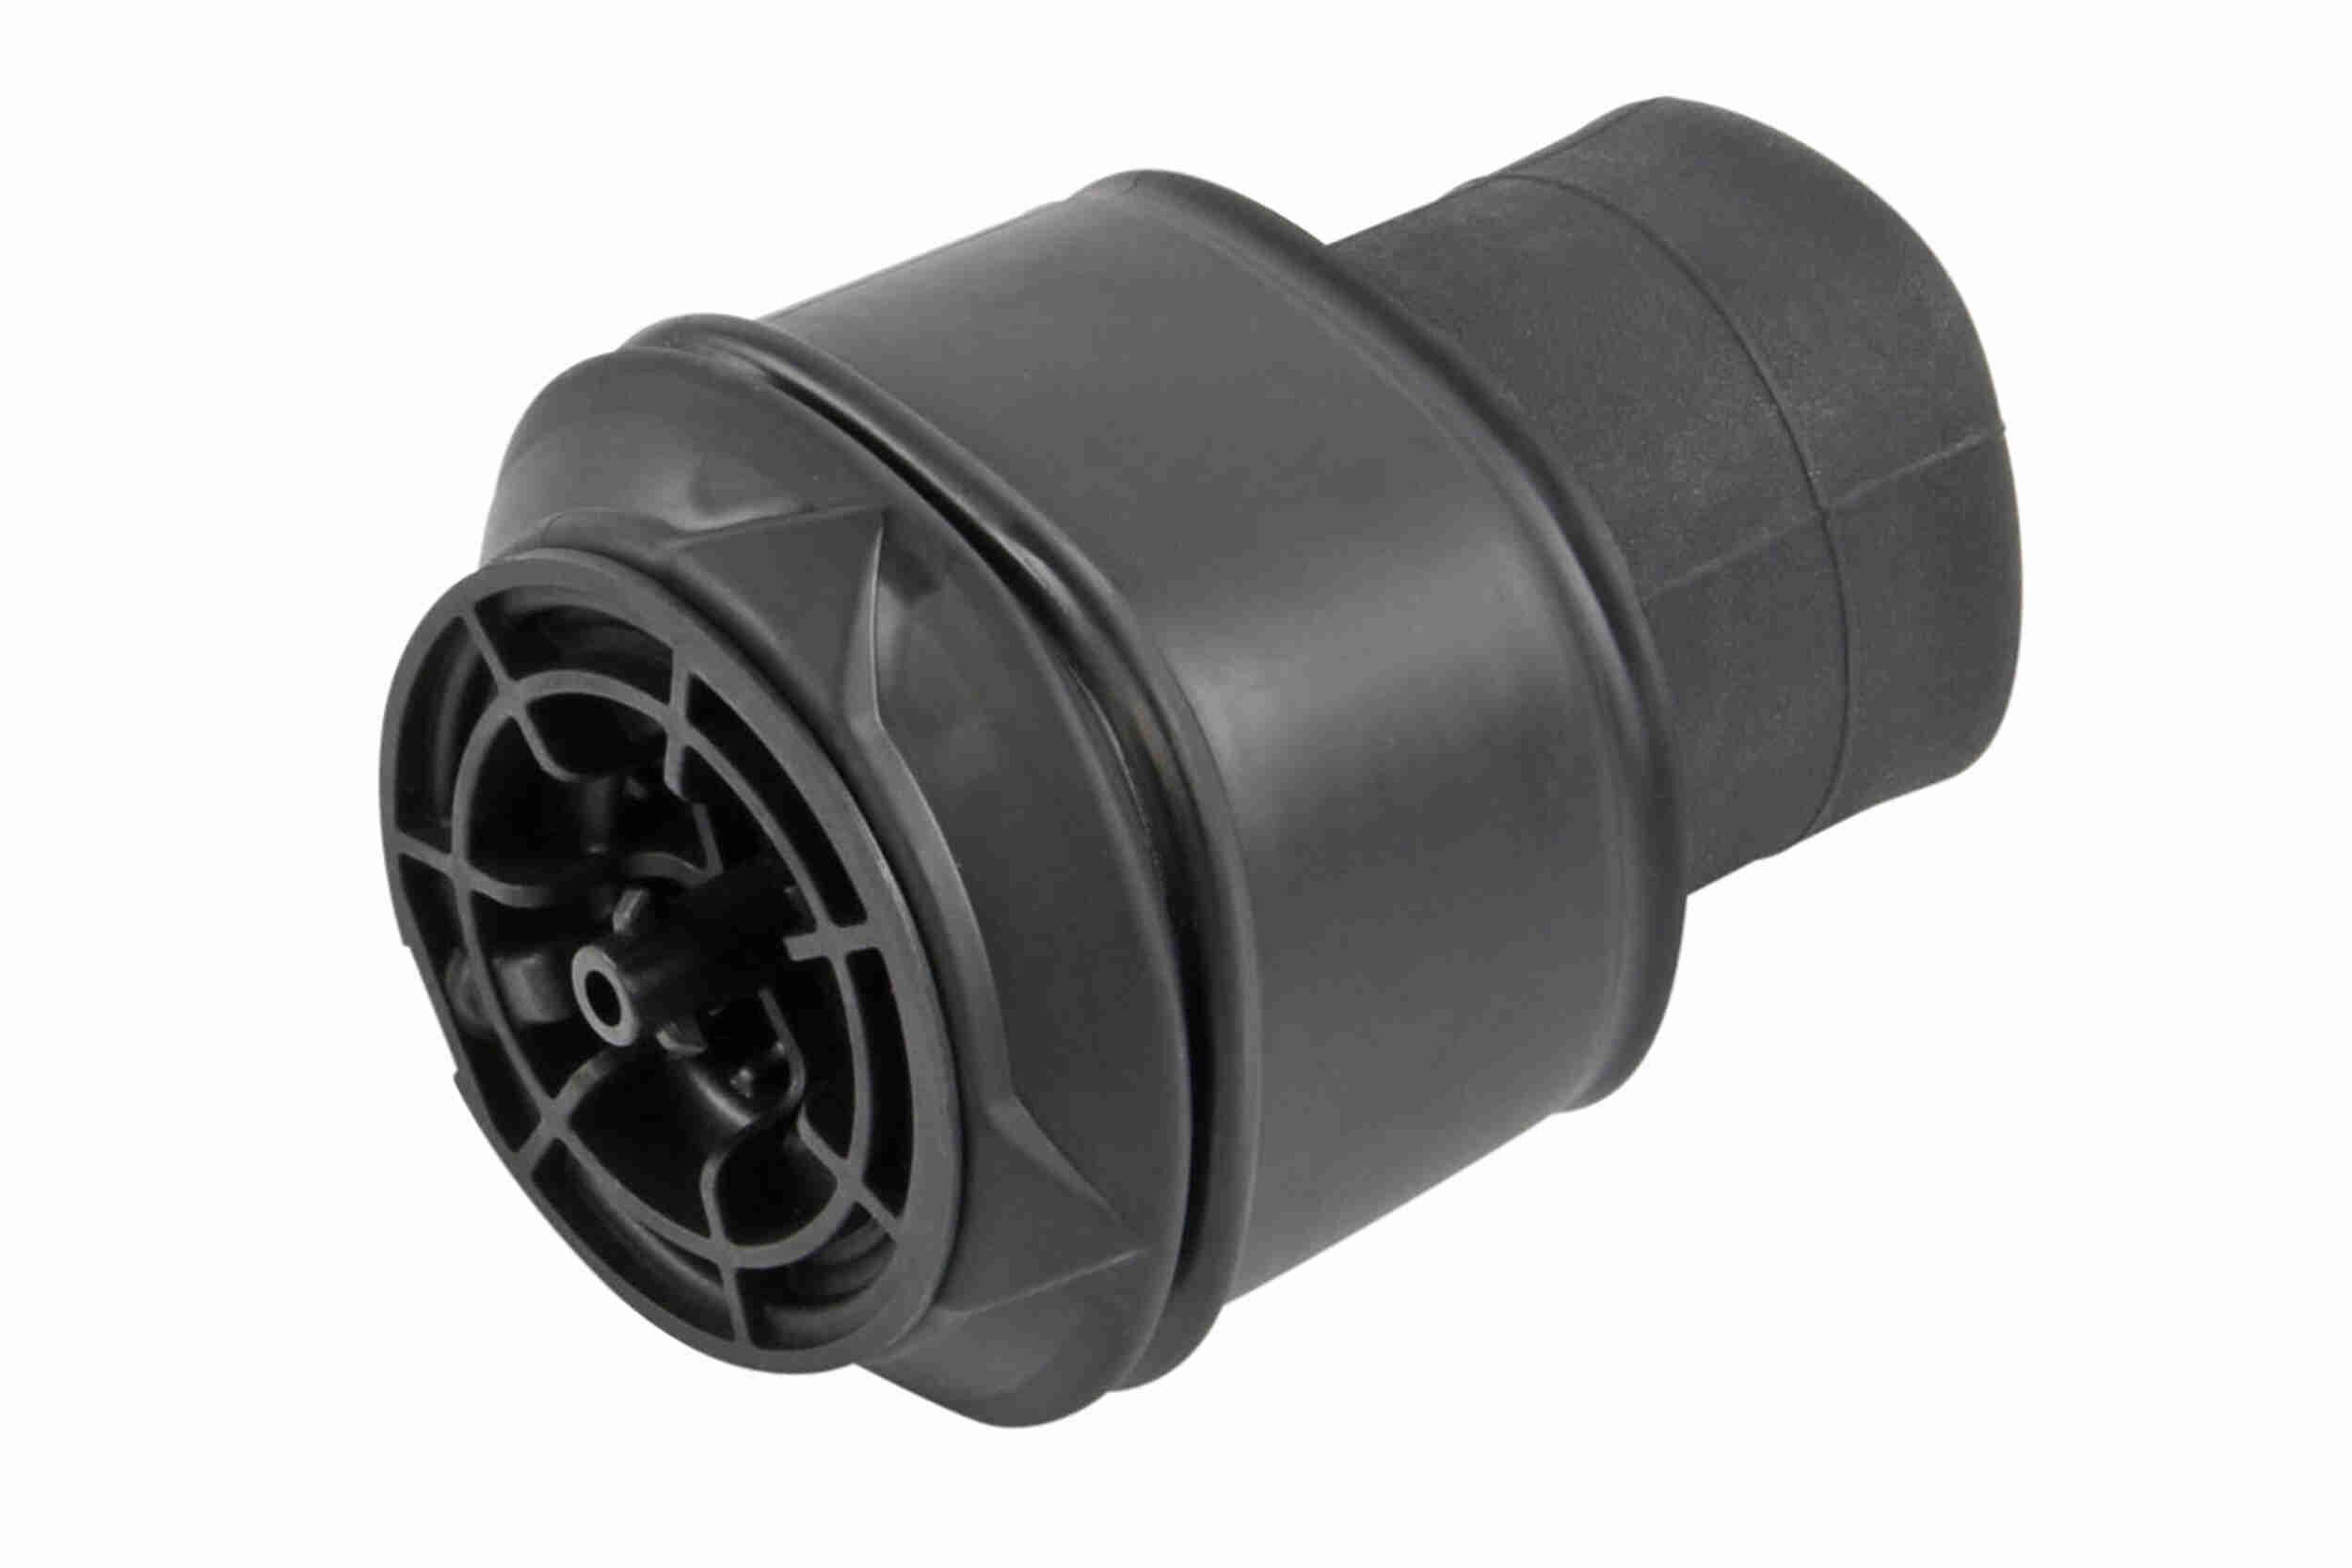 VEMO: Original Luftfederbein V22-50-0002 ()